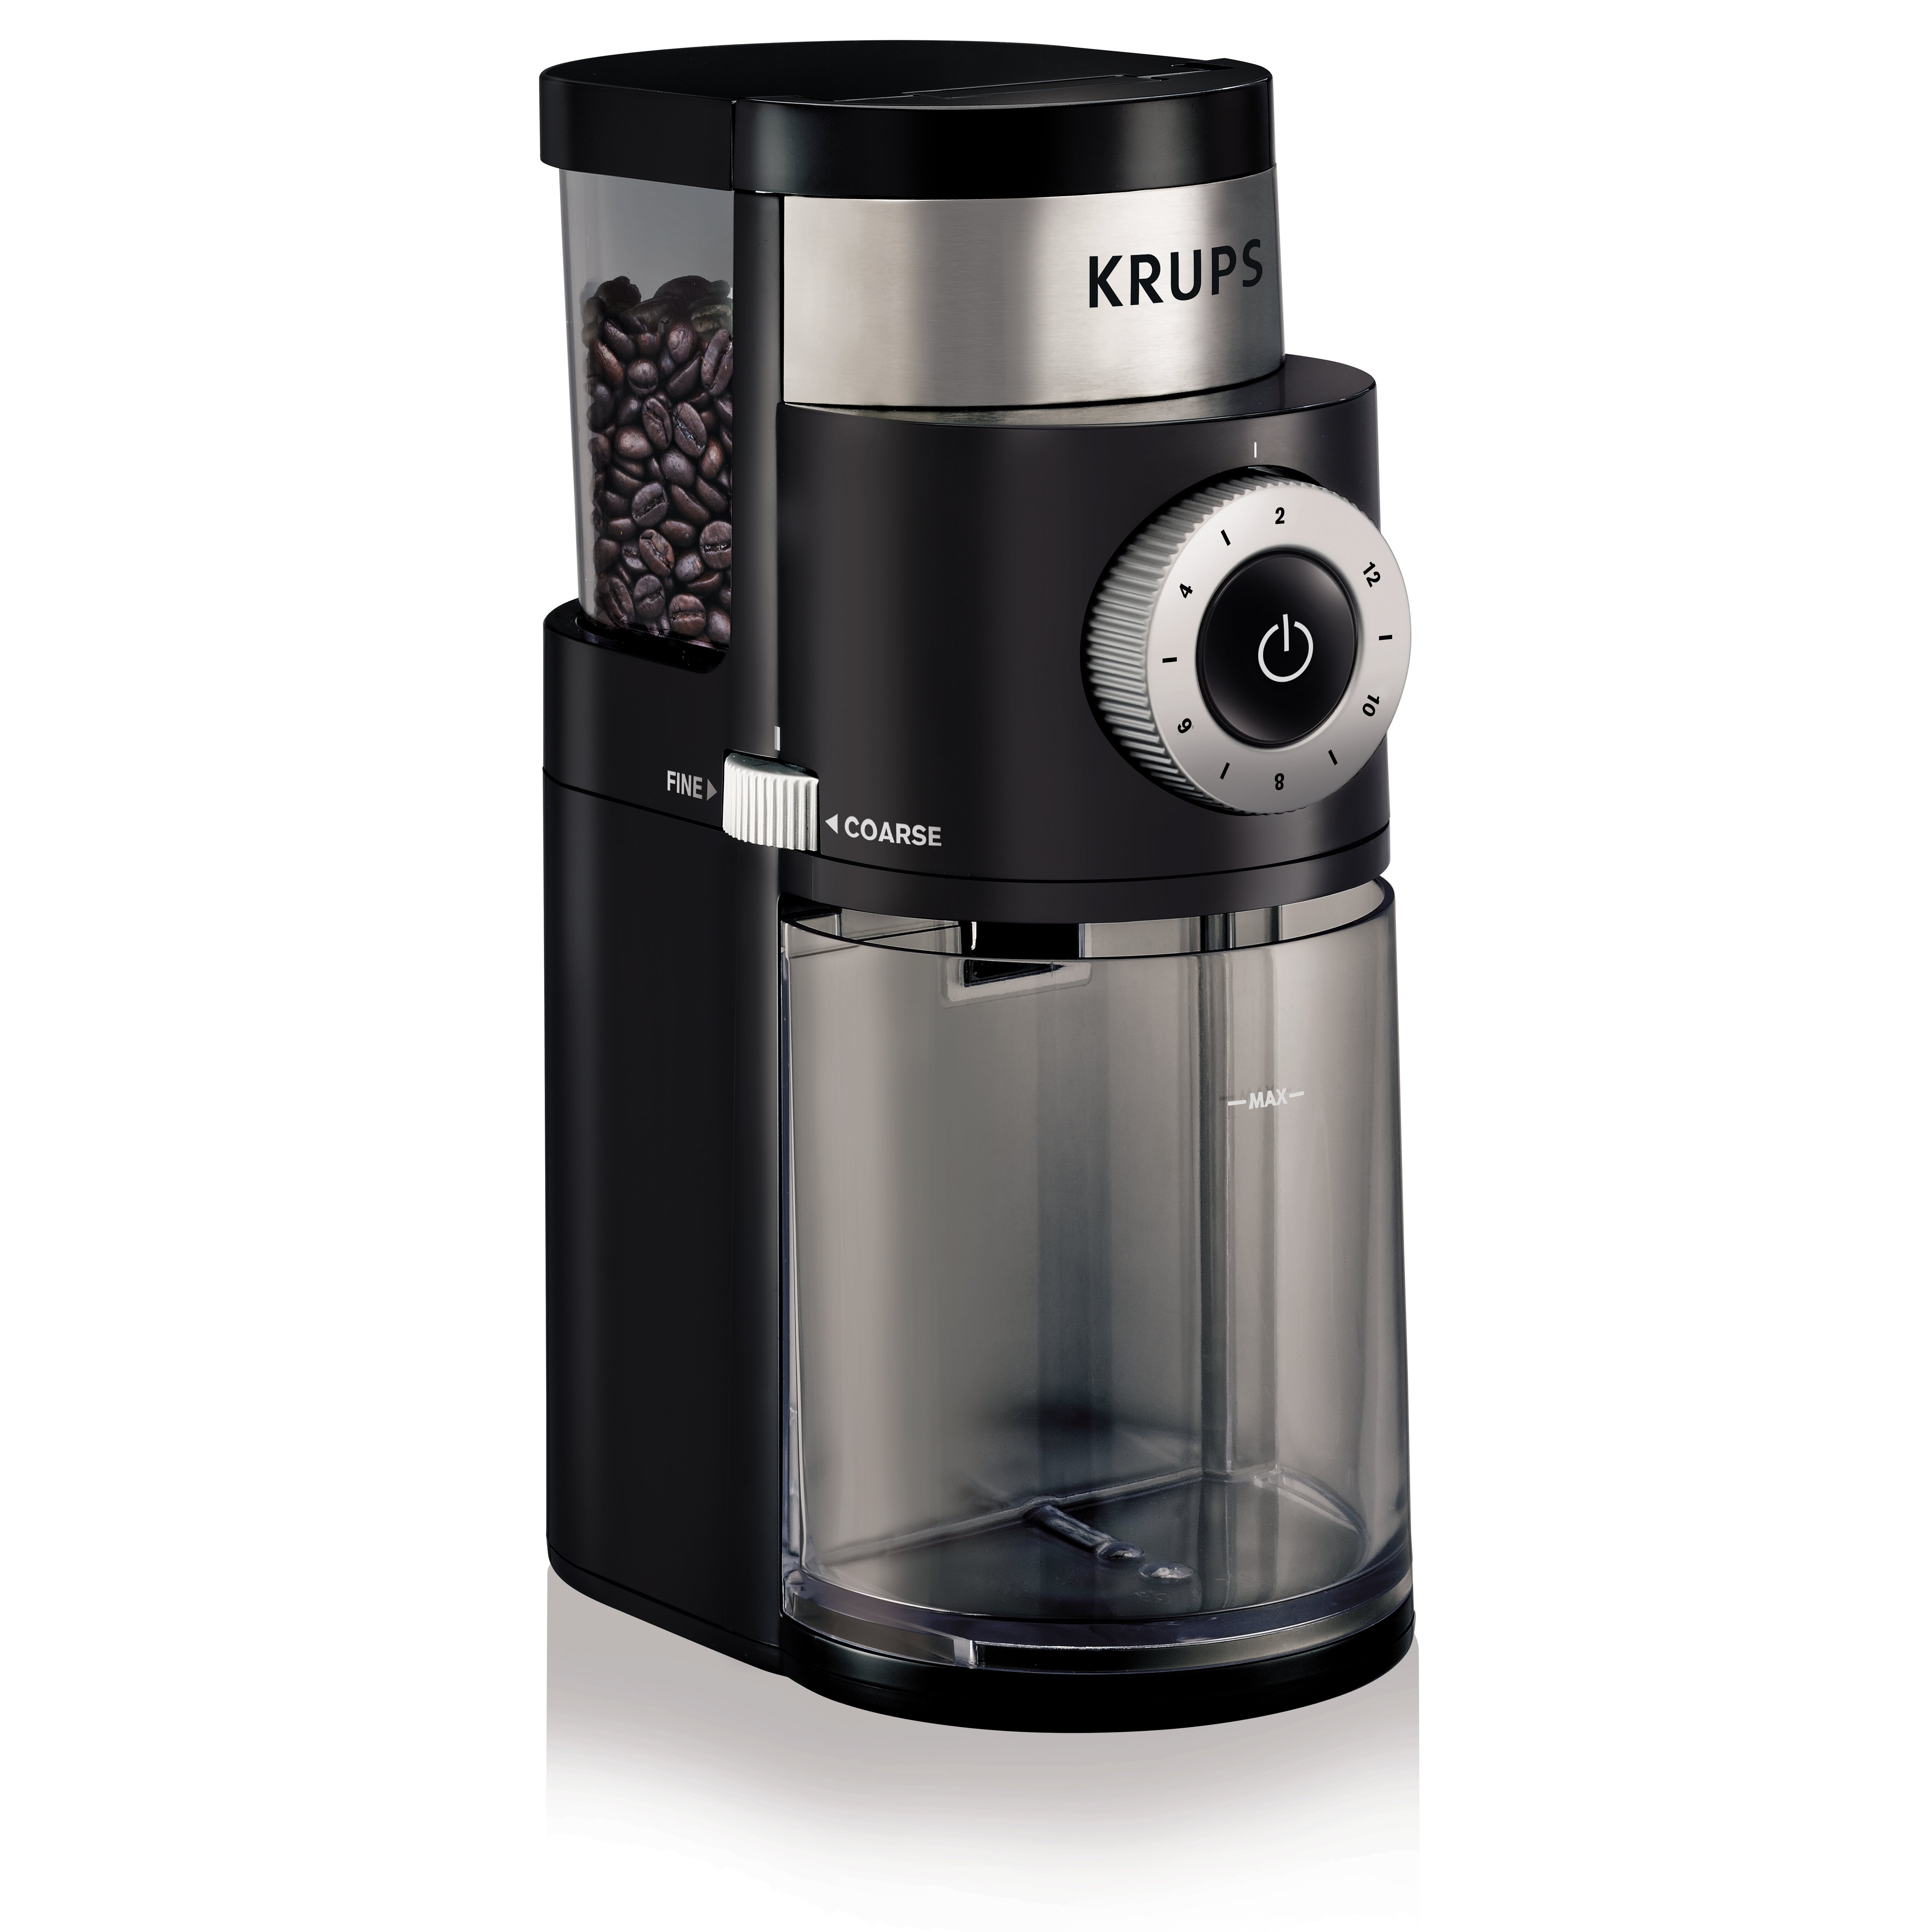 Krups Coffee Grinder ~ Krups professional burr black coffee grinder reviews